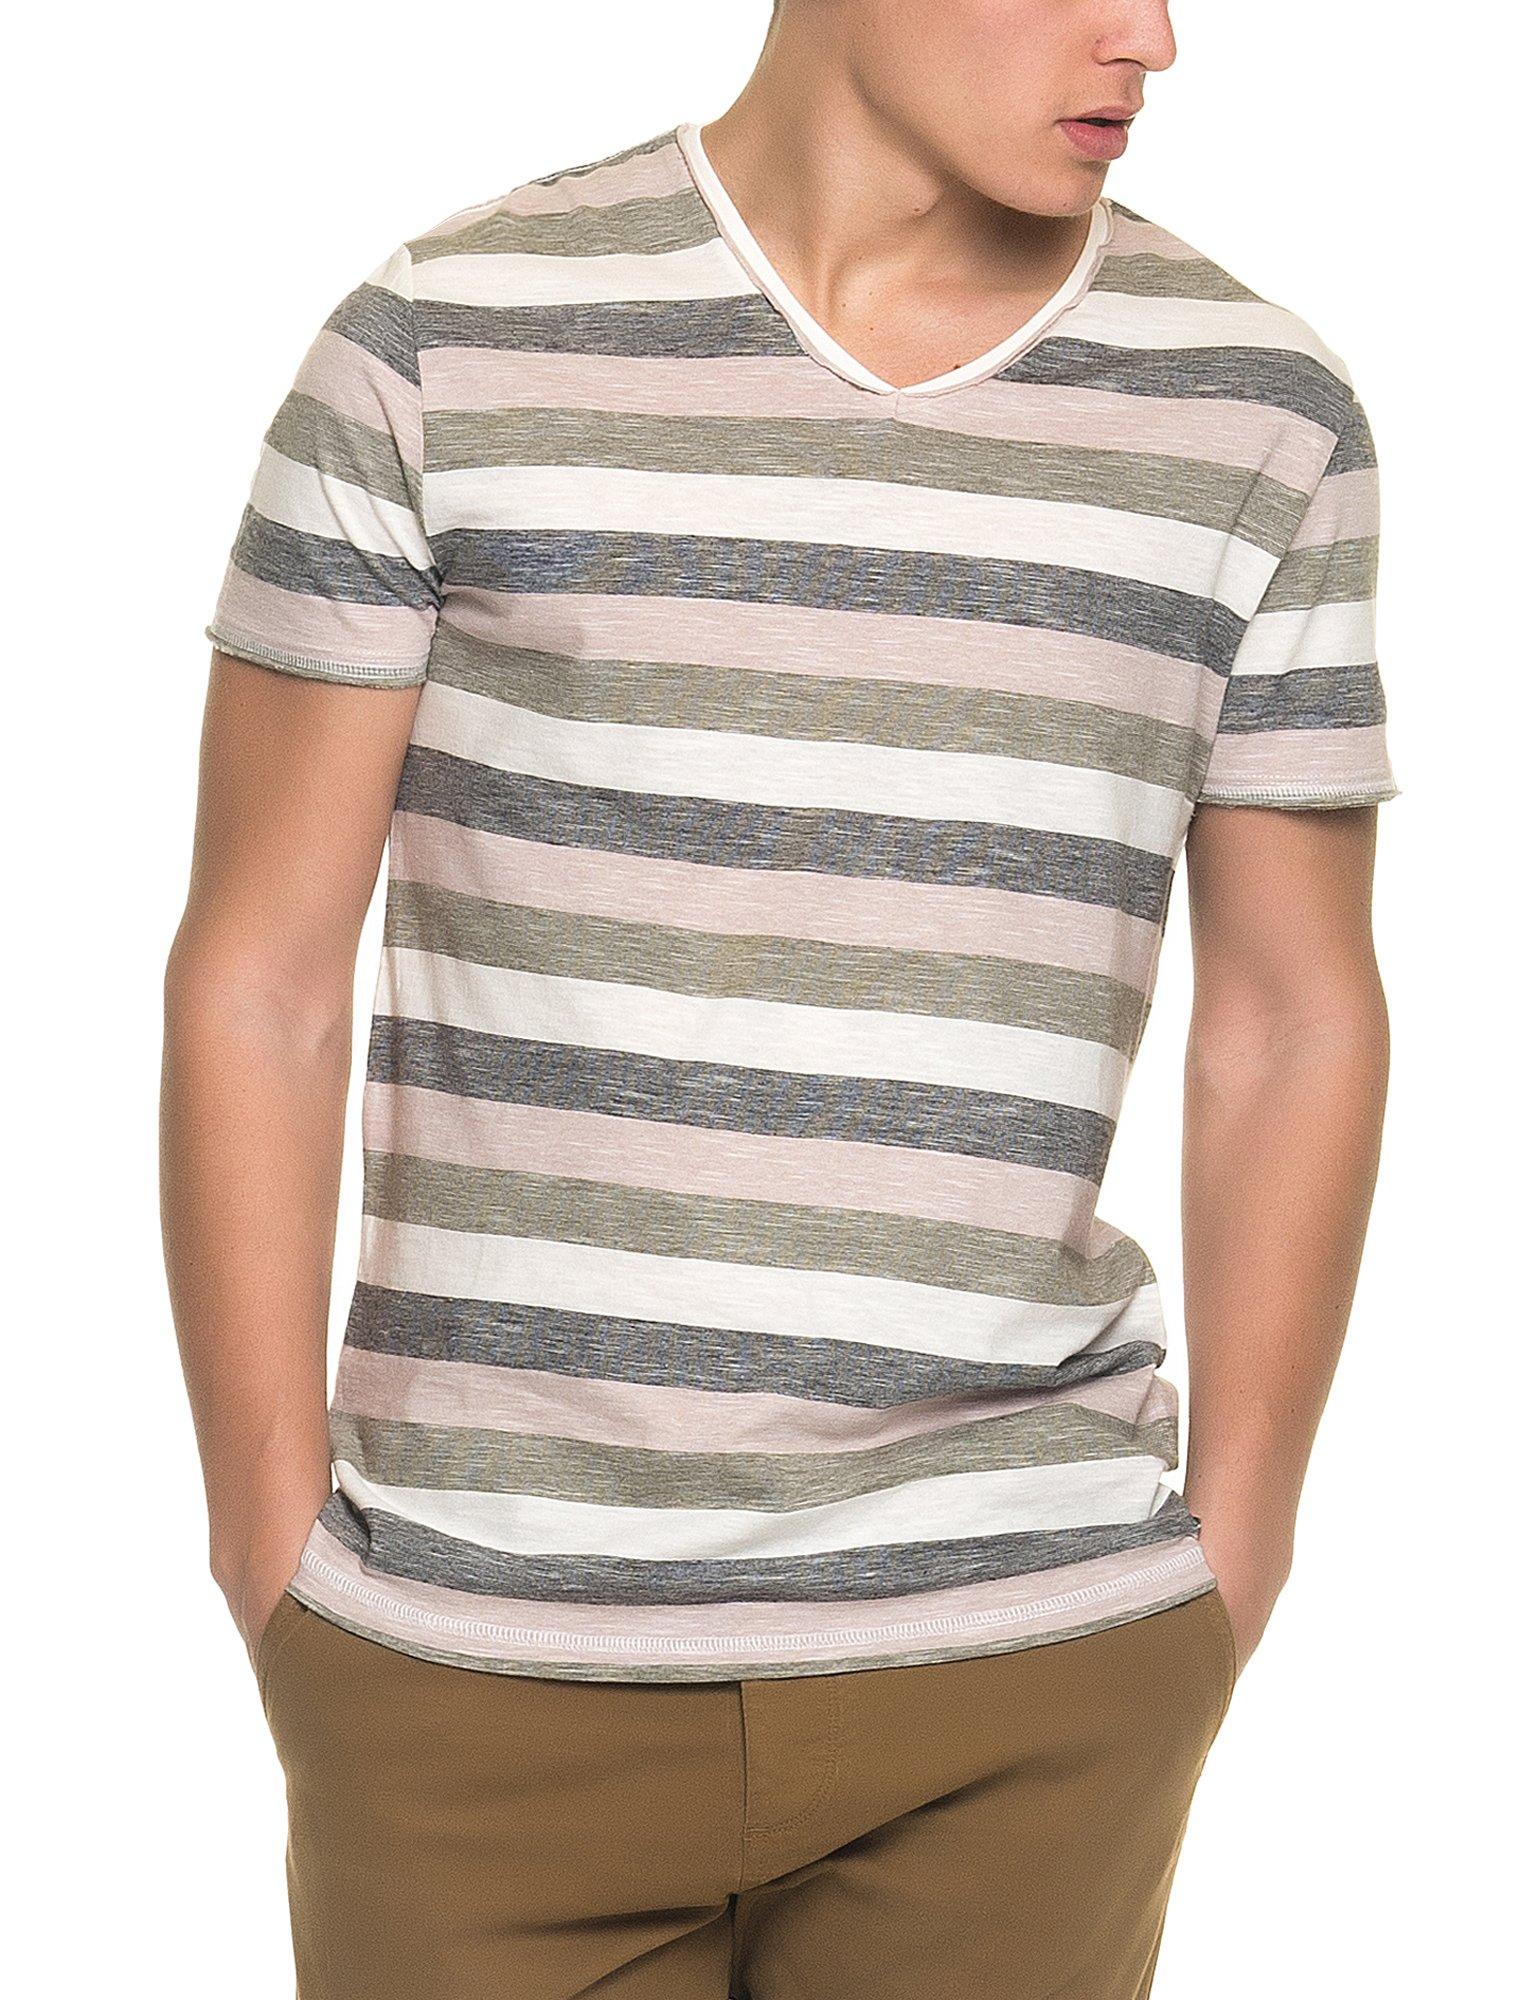 Garcia Jeans Men's Men's T-Shirt With Striped Print in Size XL Multicolour